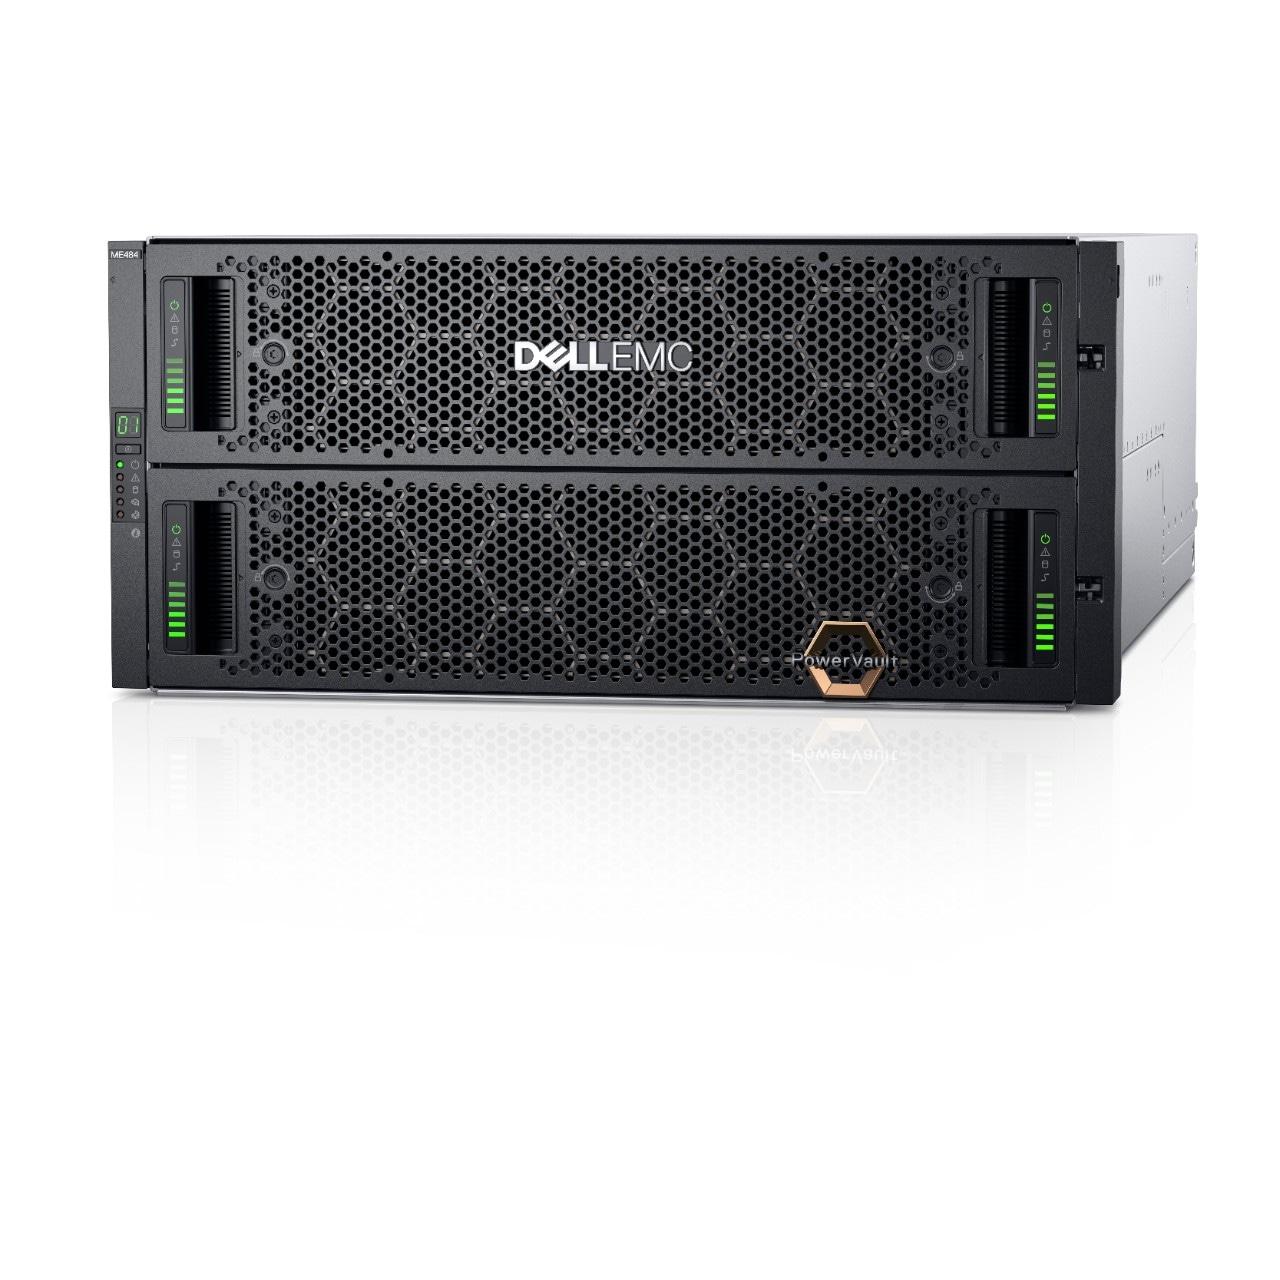 PowerVault ME484 Storage Expansion Enclosure